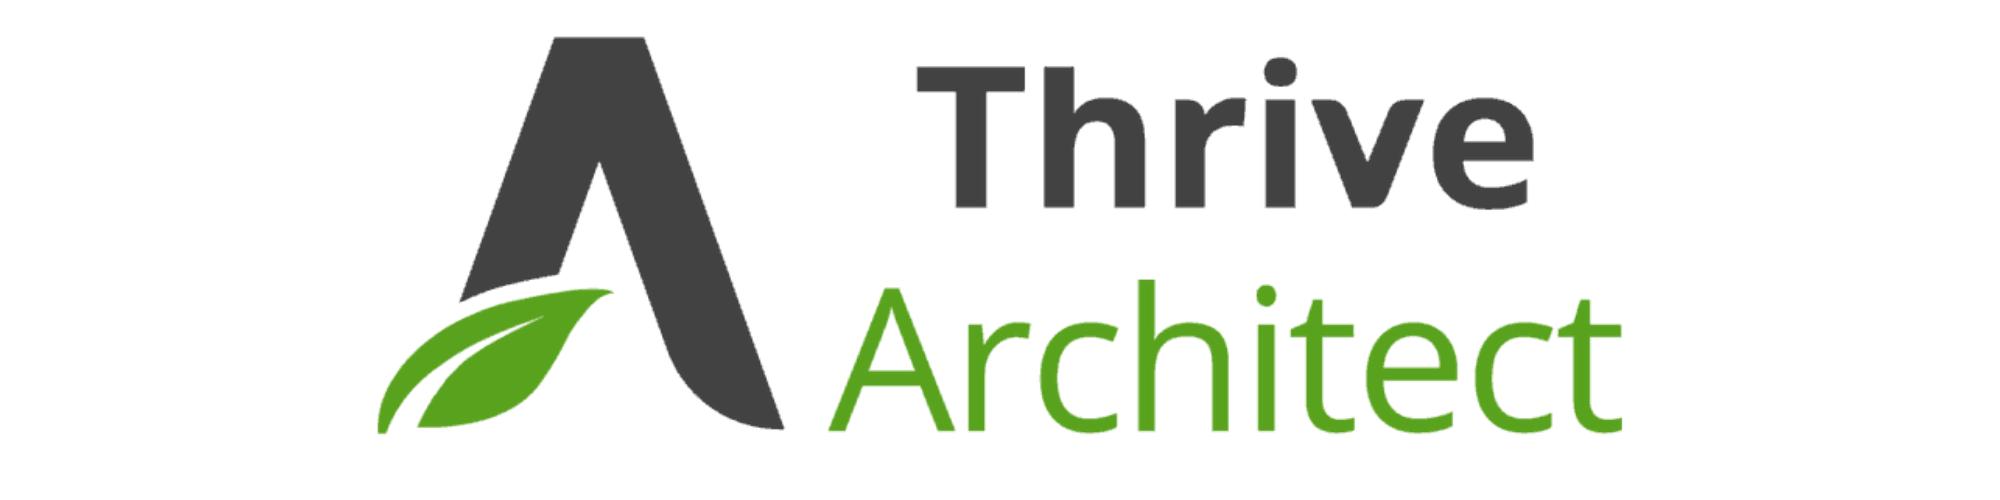 Banner Thrive Architect